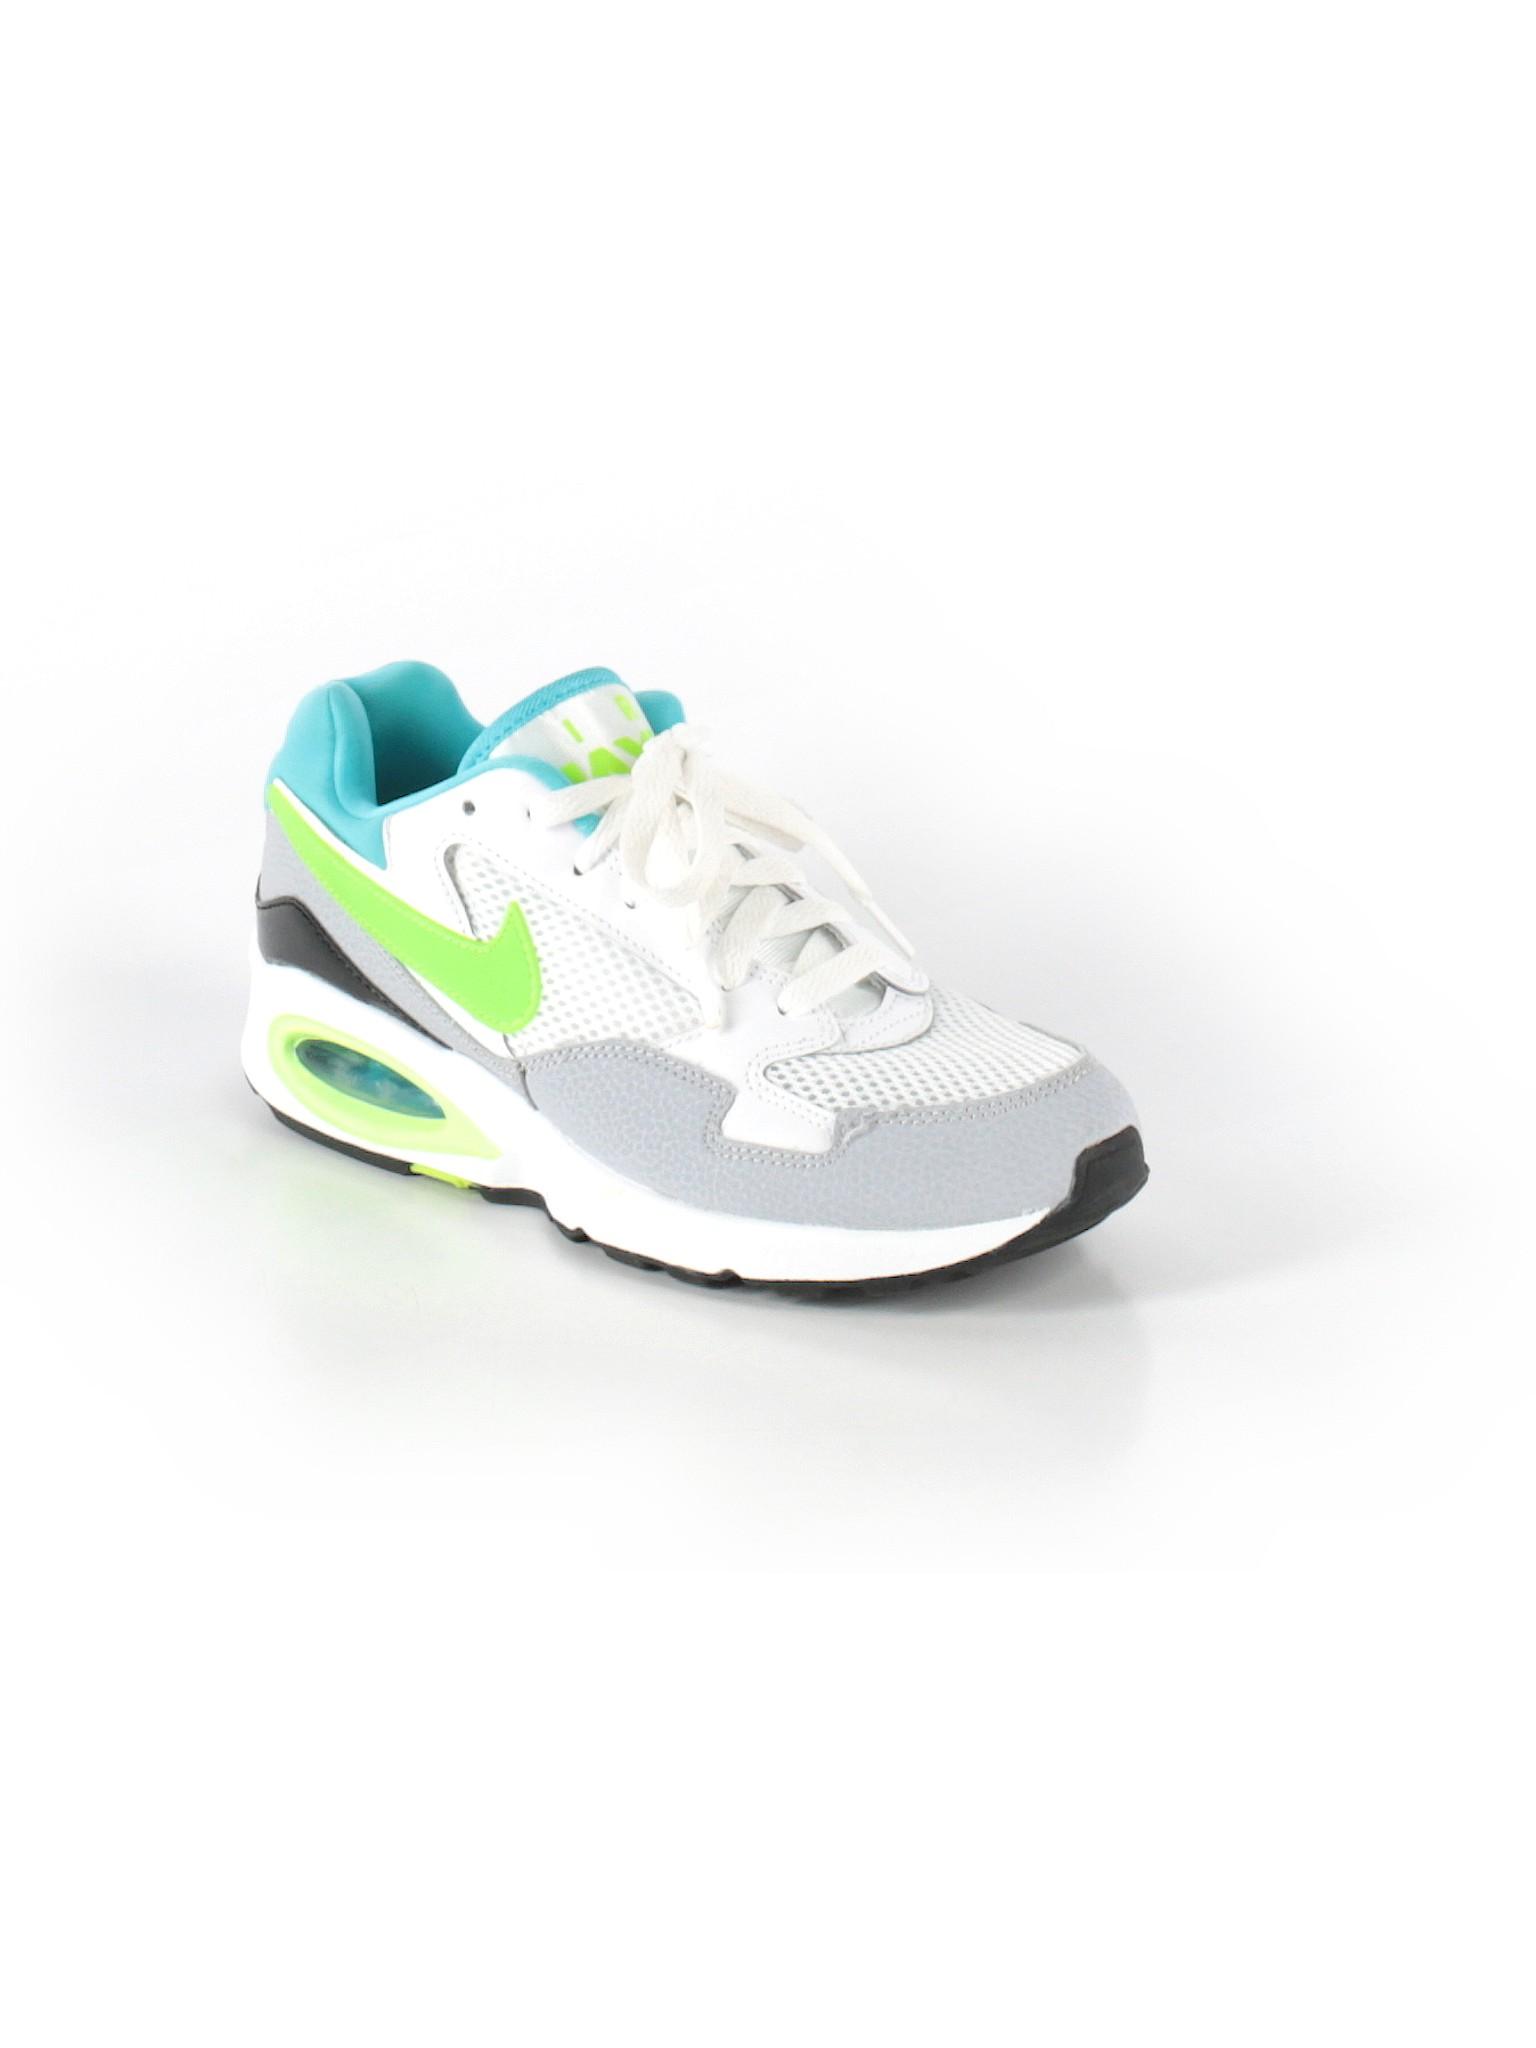 Nike promotion Boutique Sneakers Boutique promotion zwtxw